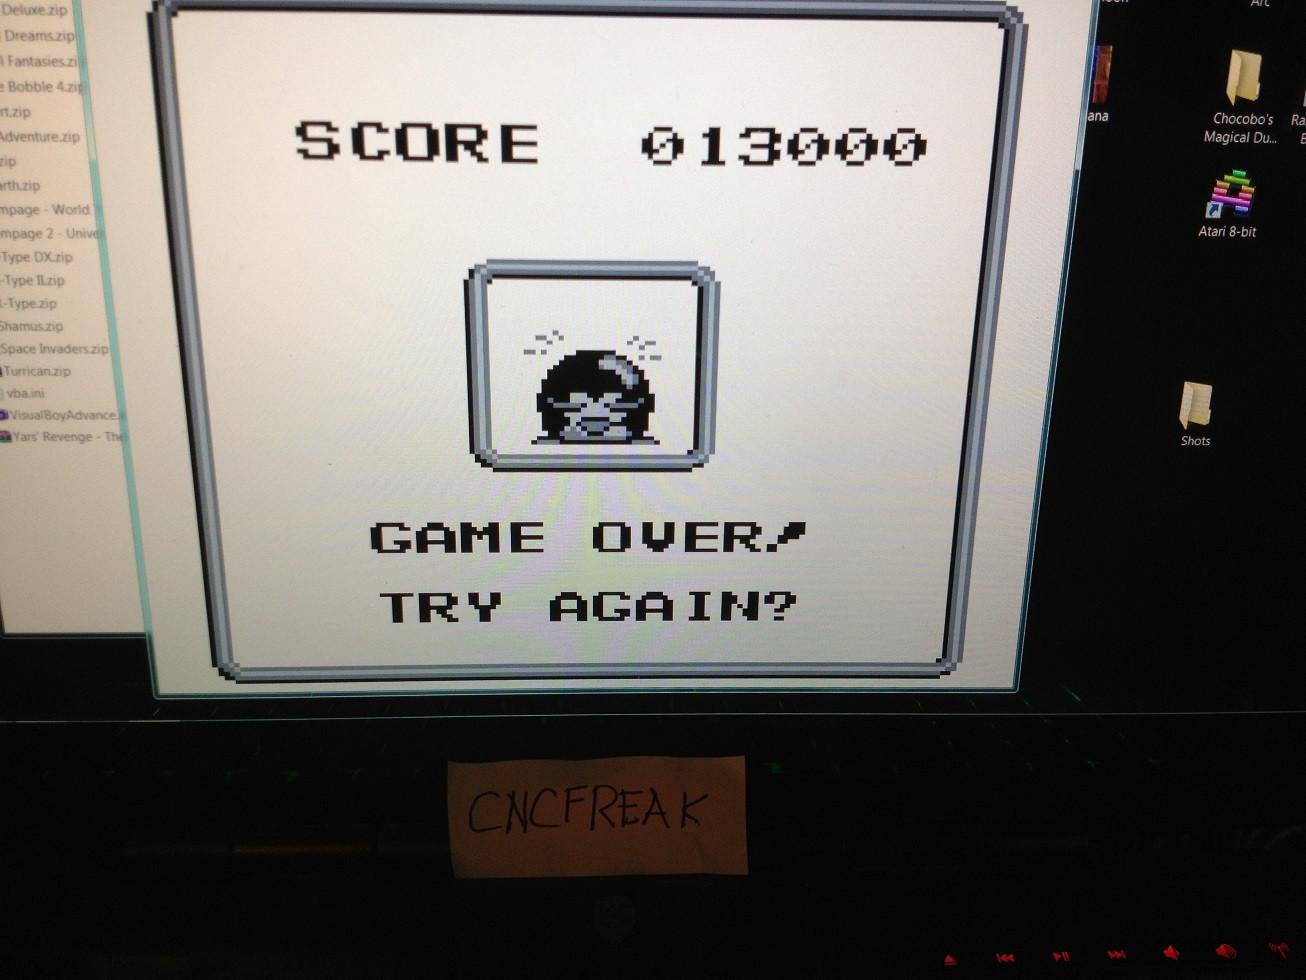 Penguin Wars 13,000 points